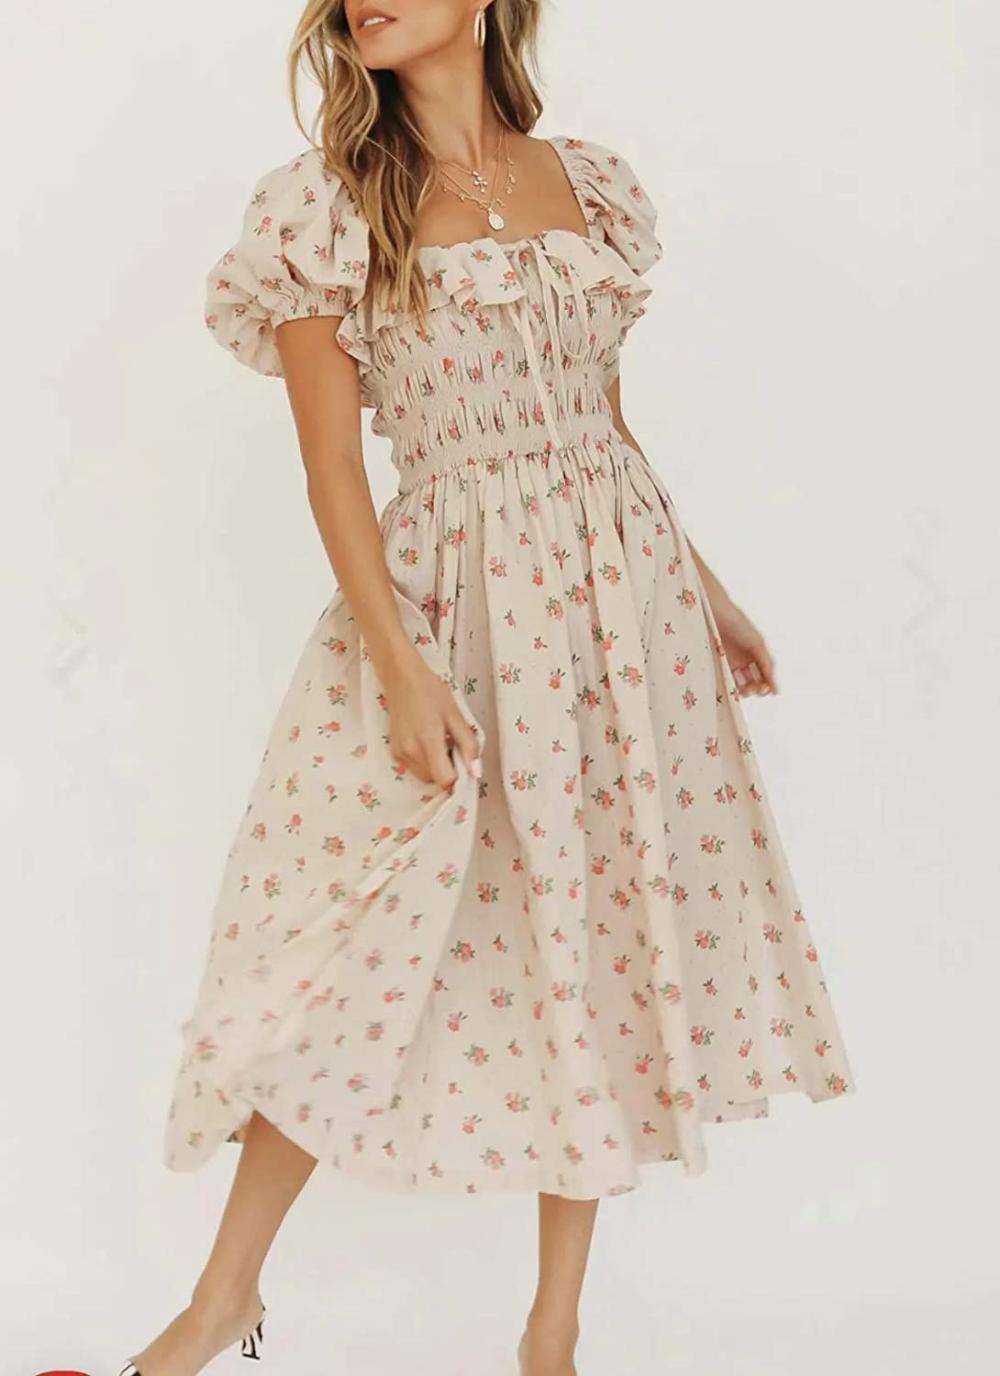 Amazon Com R Vivimos Womens Summer Floral Print Puff Sleeves Vintage Ruffles Midi Dress Medium Beige Cottagecore Fashion Ruffle Midi Dress Midi Ruffle Dress [ 1376 x 1000 Pixel ]